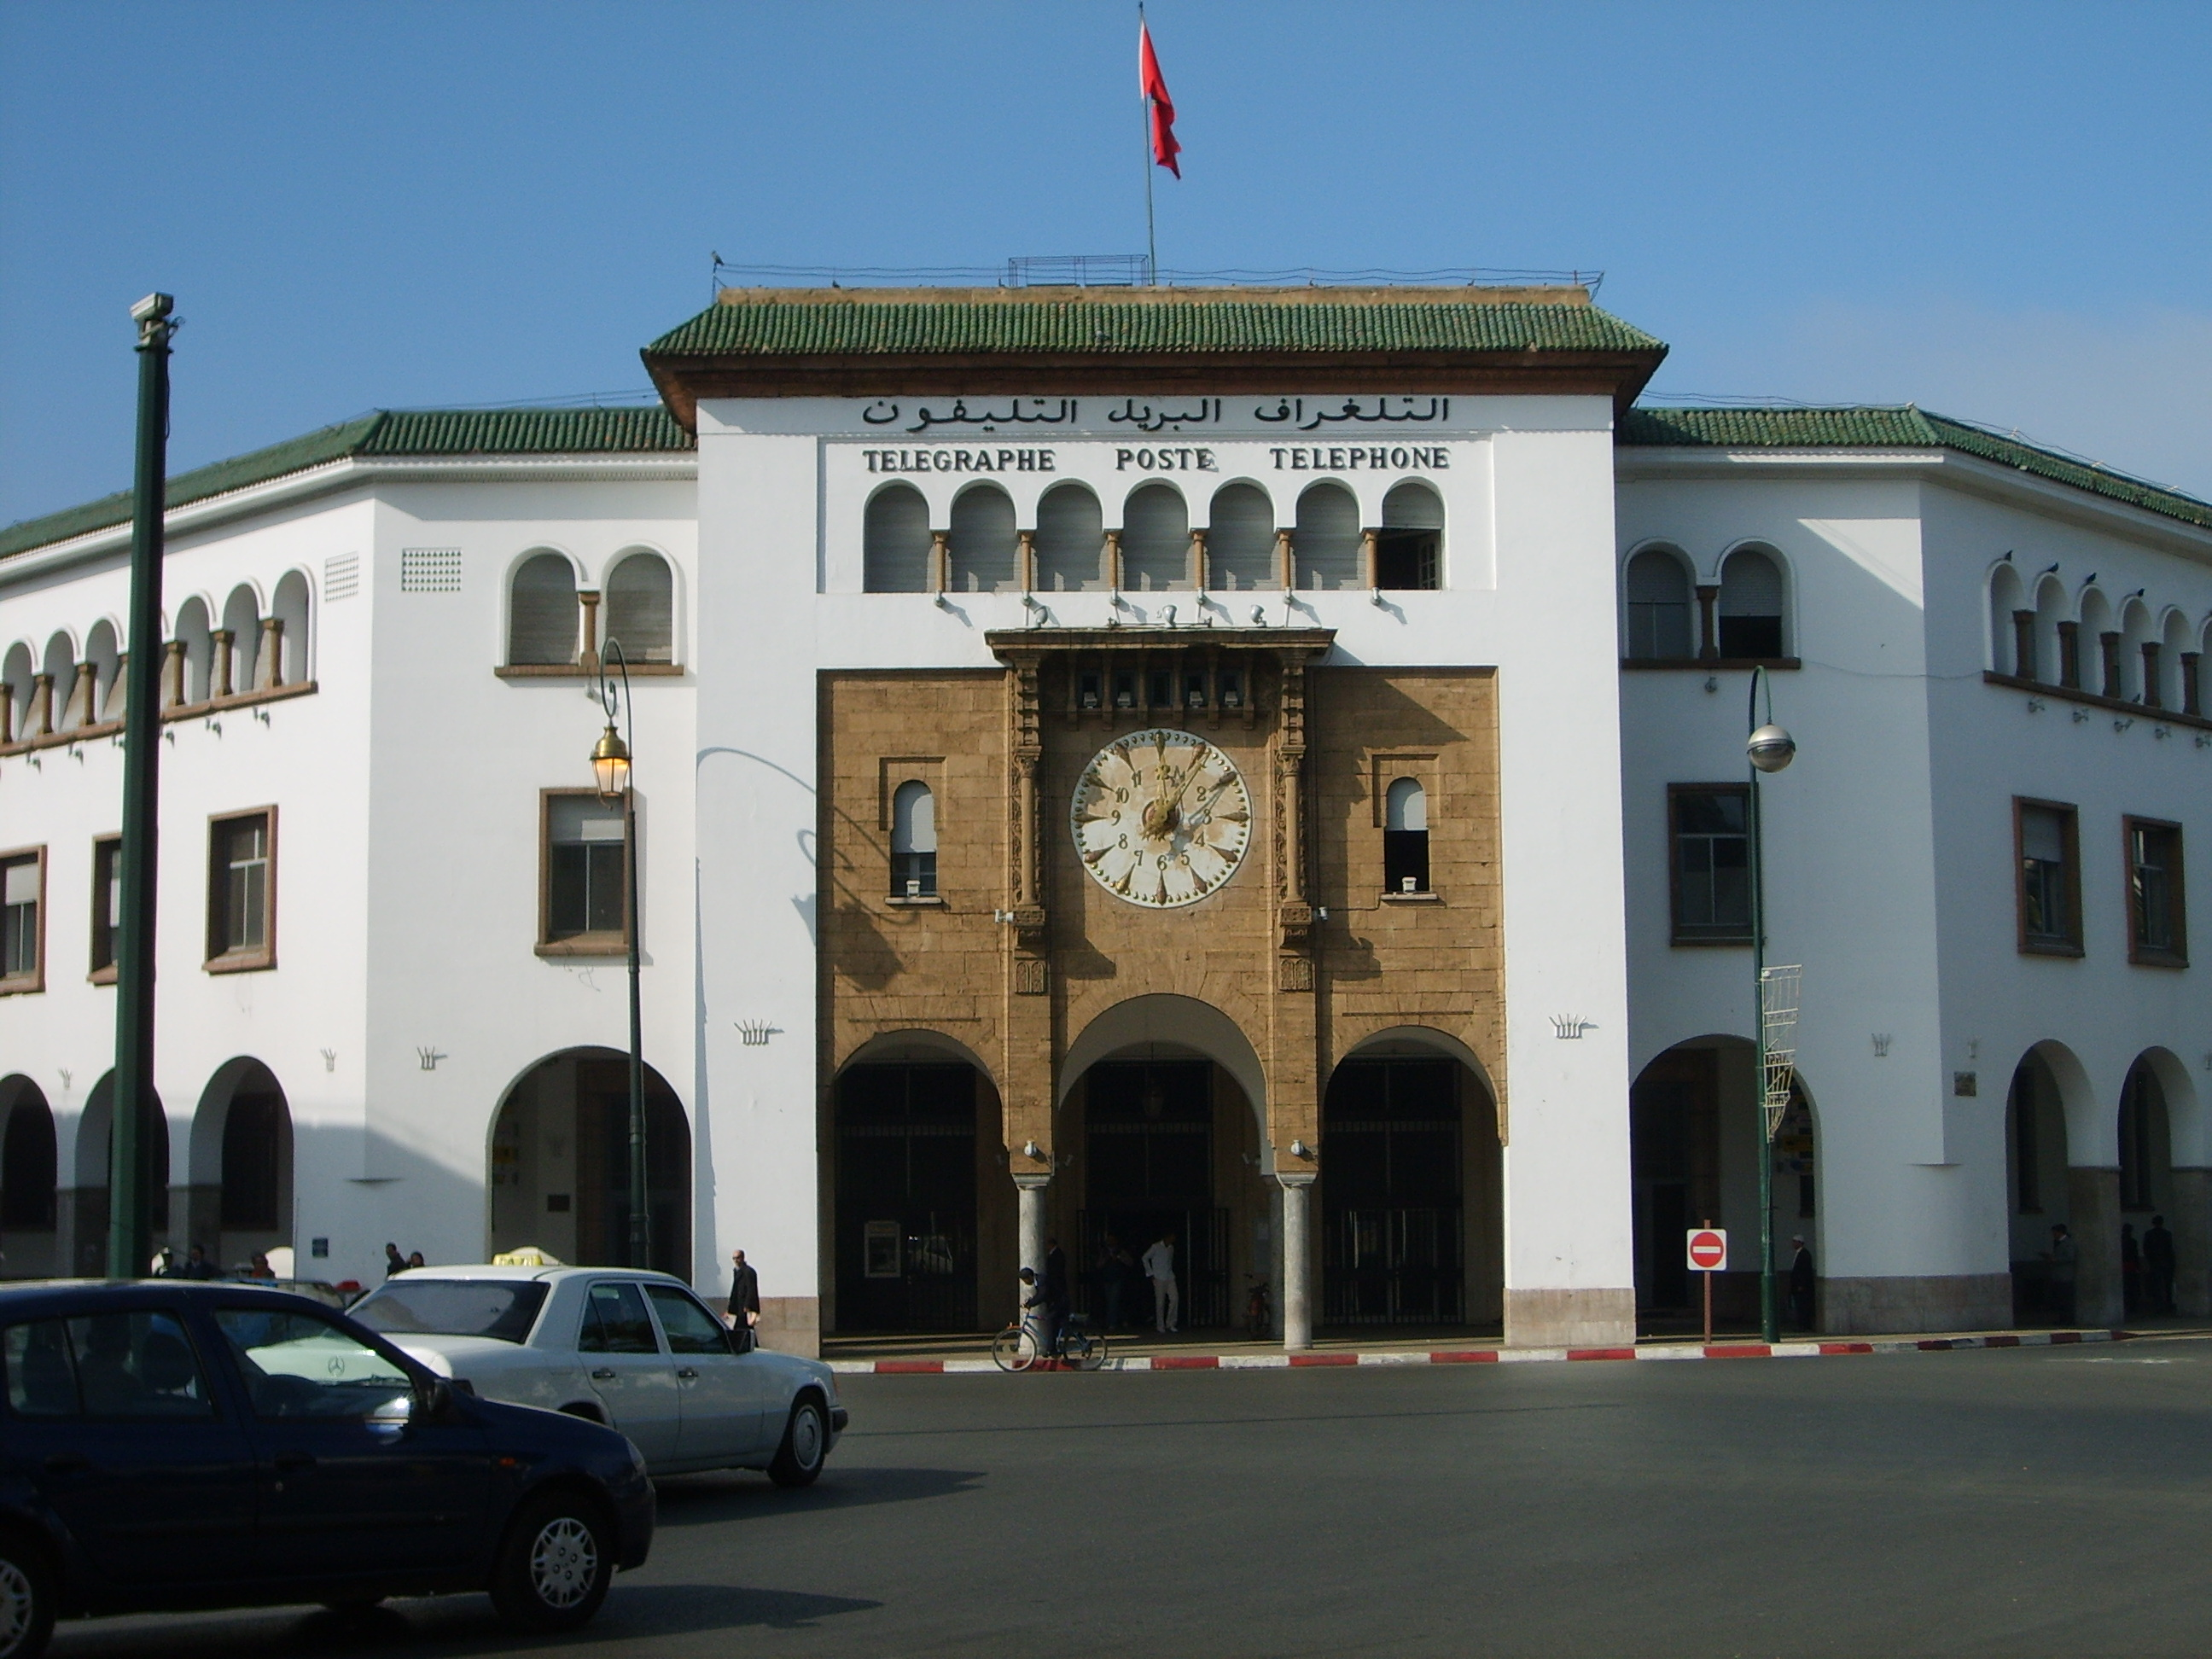 Rabat,_Telegraphe_Poste_Telephone